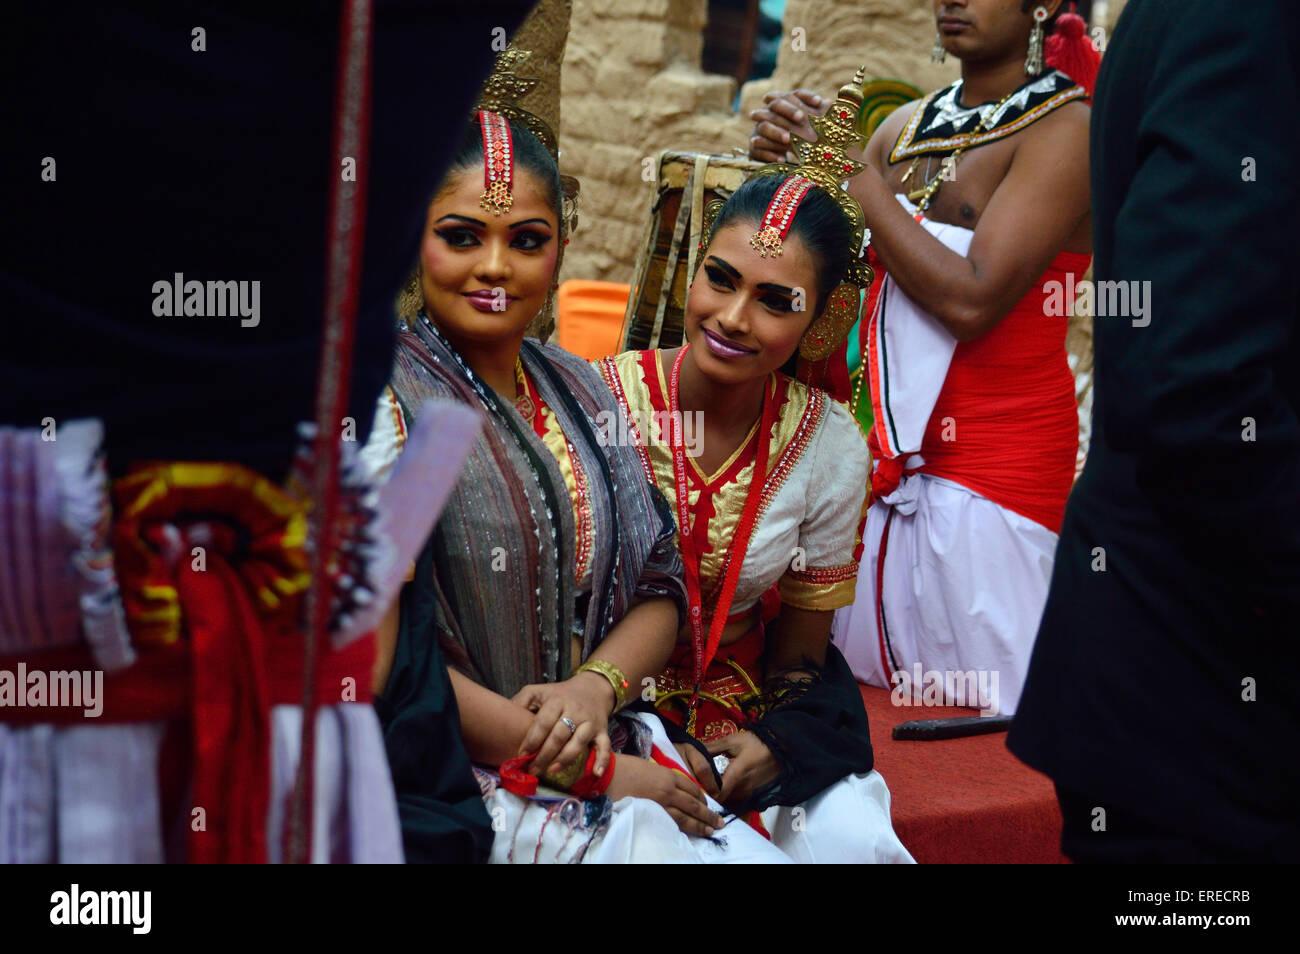 29 Mestieri Surajkund Mela Faridabad Haryana India 1 Feb 2016 Immagini Stock